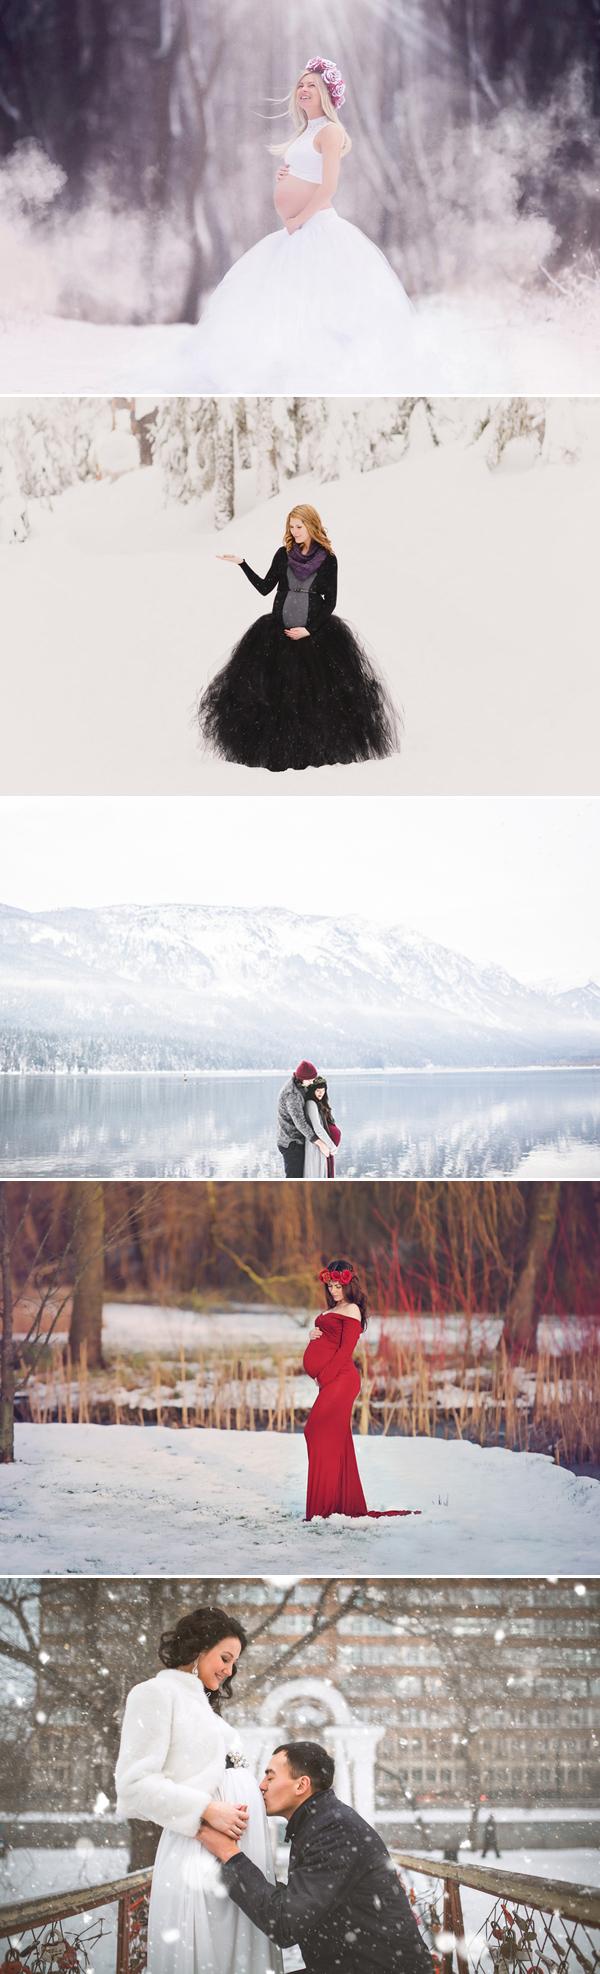 babymoon05-winterwonderland